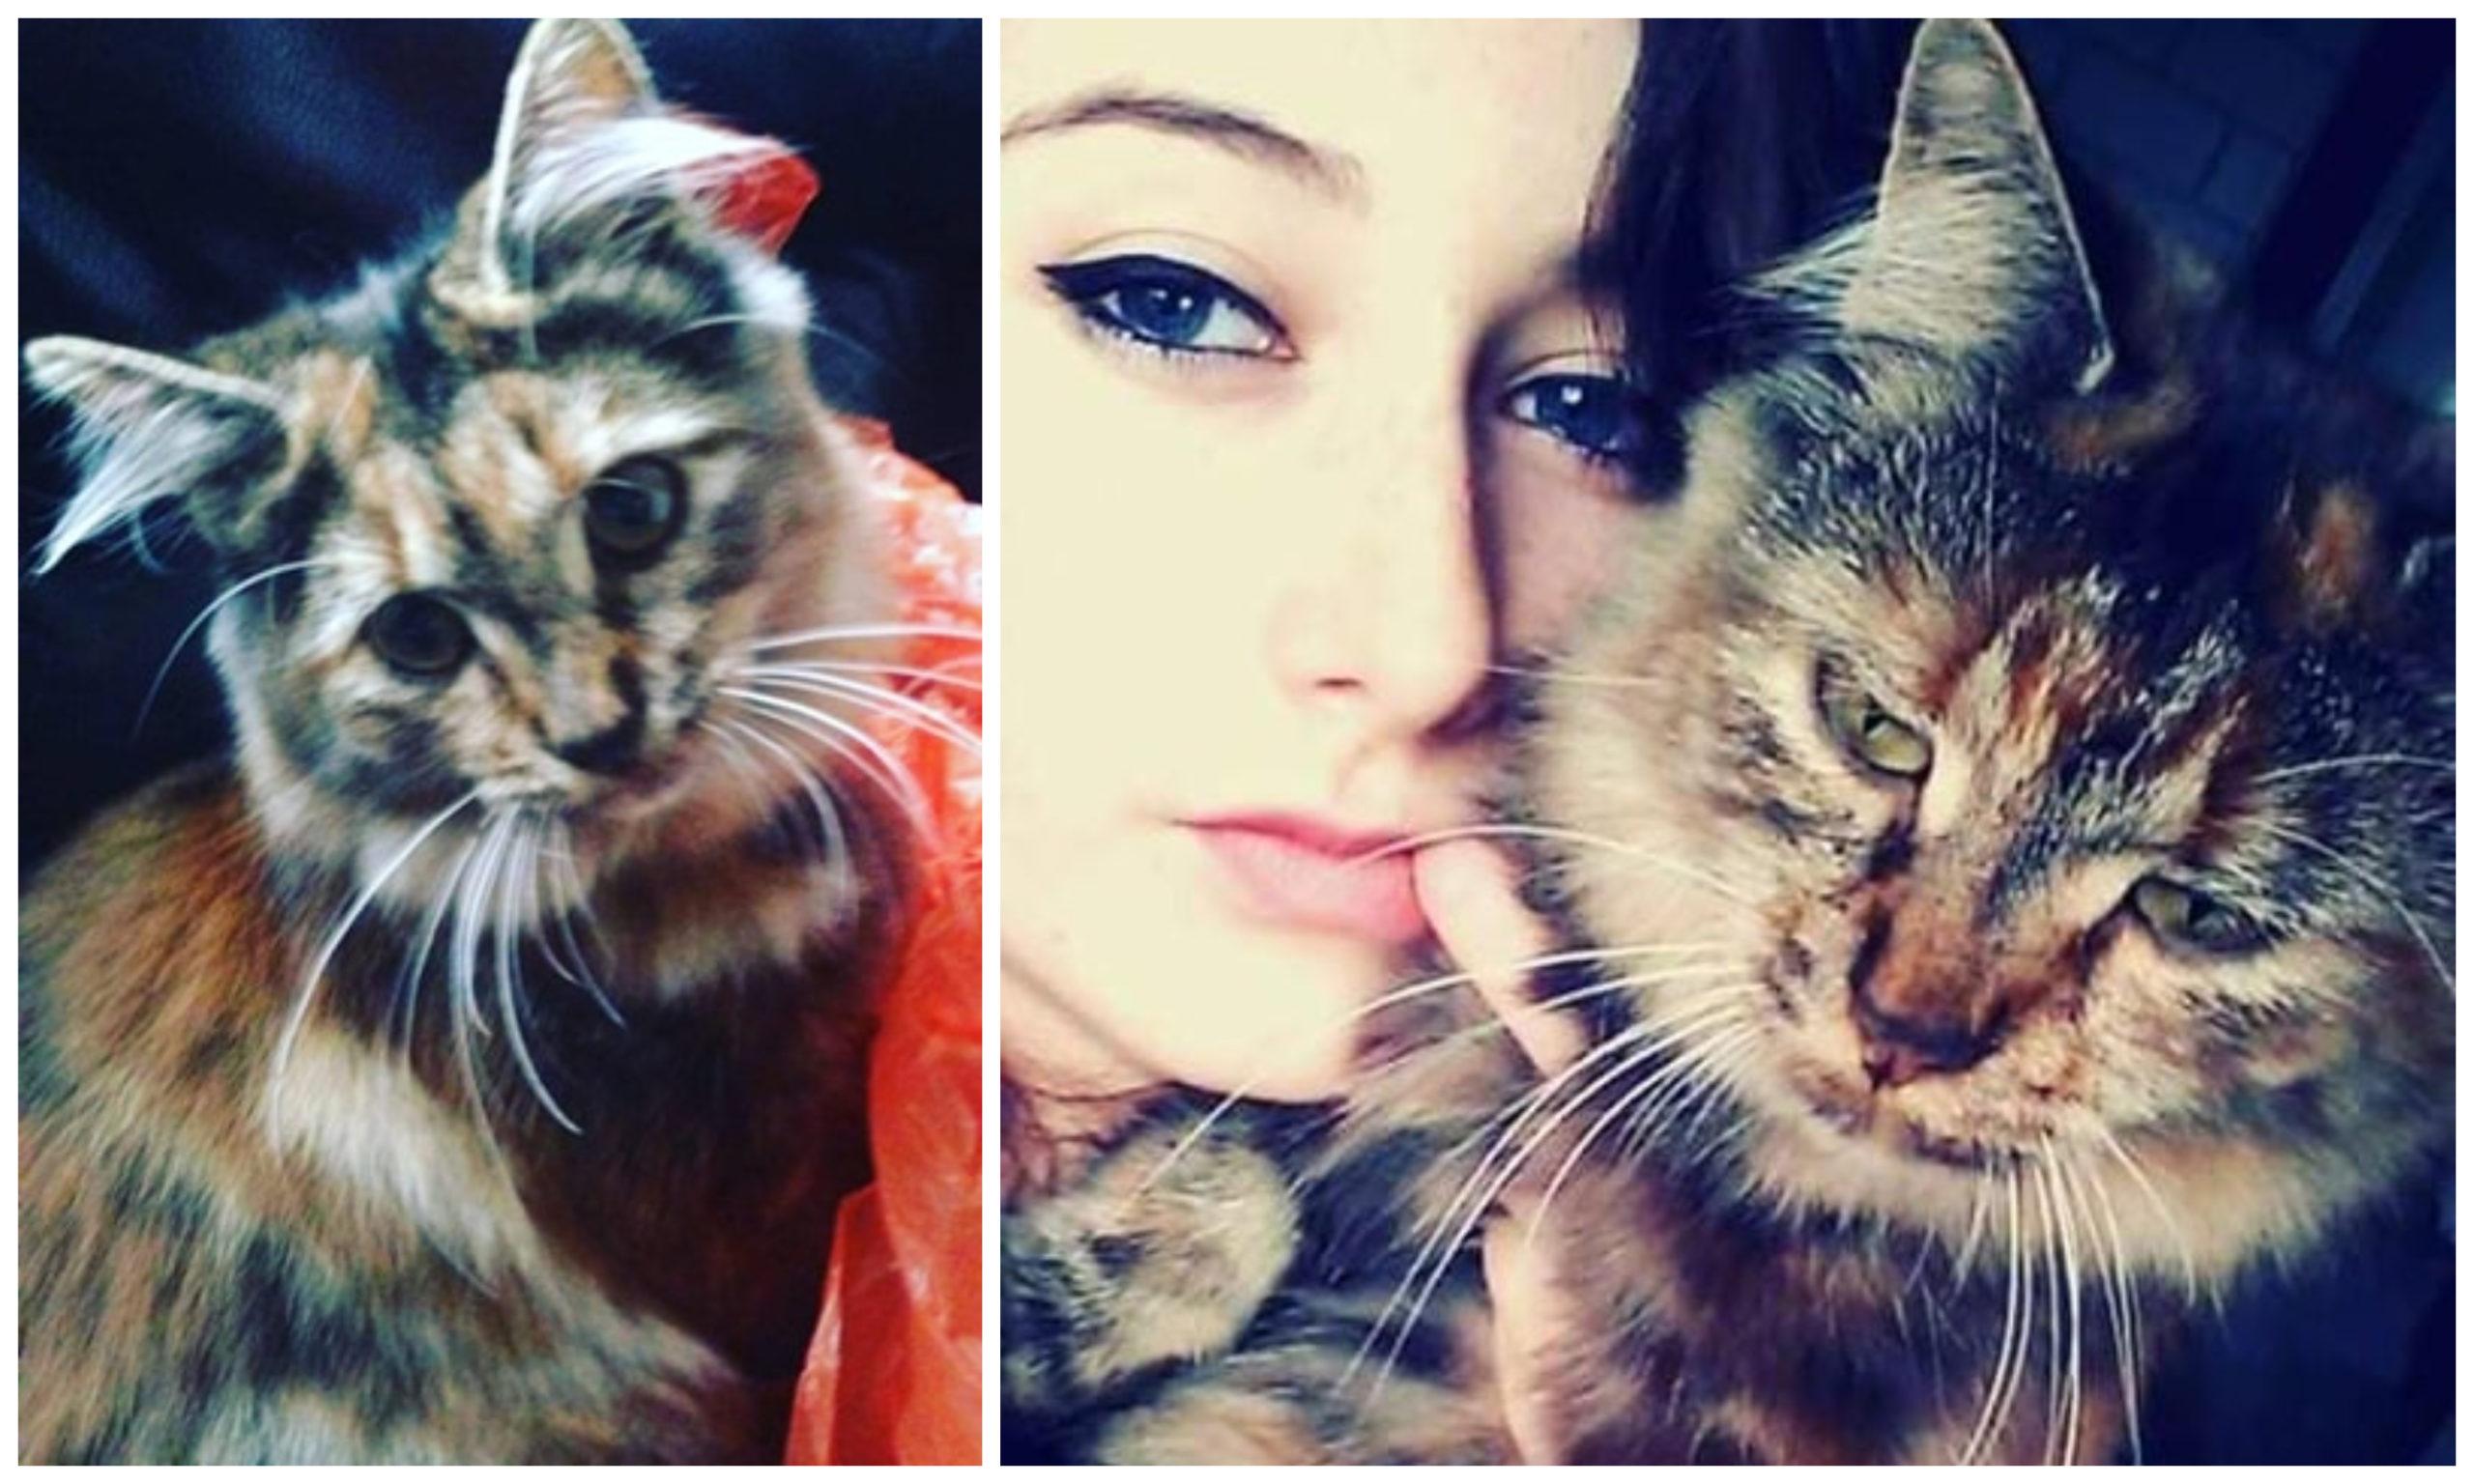 Caitlan Pratt has been left devastated after cat Lulu was run over.